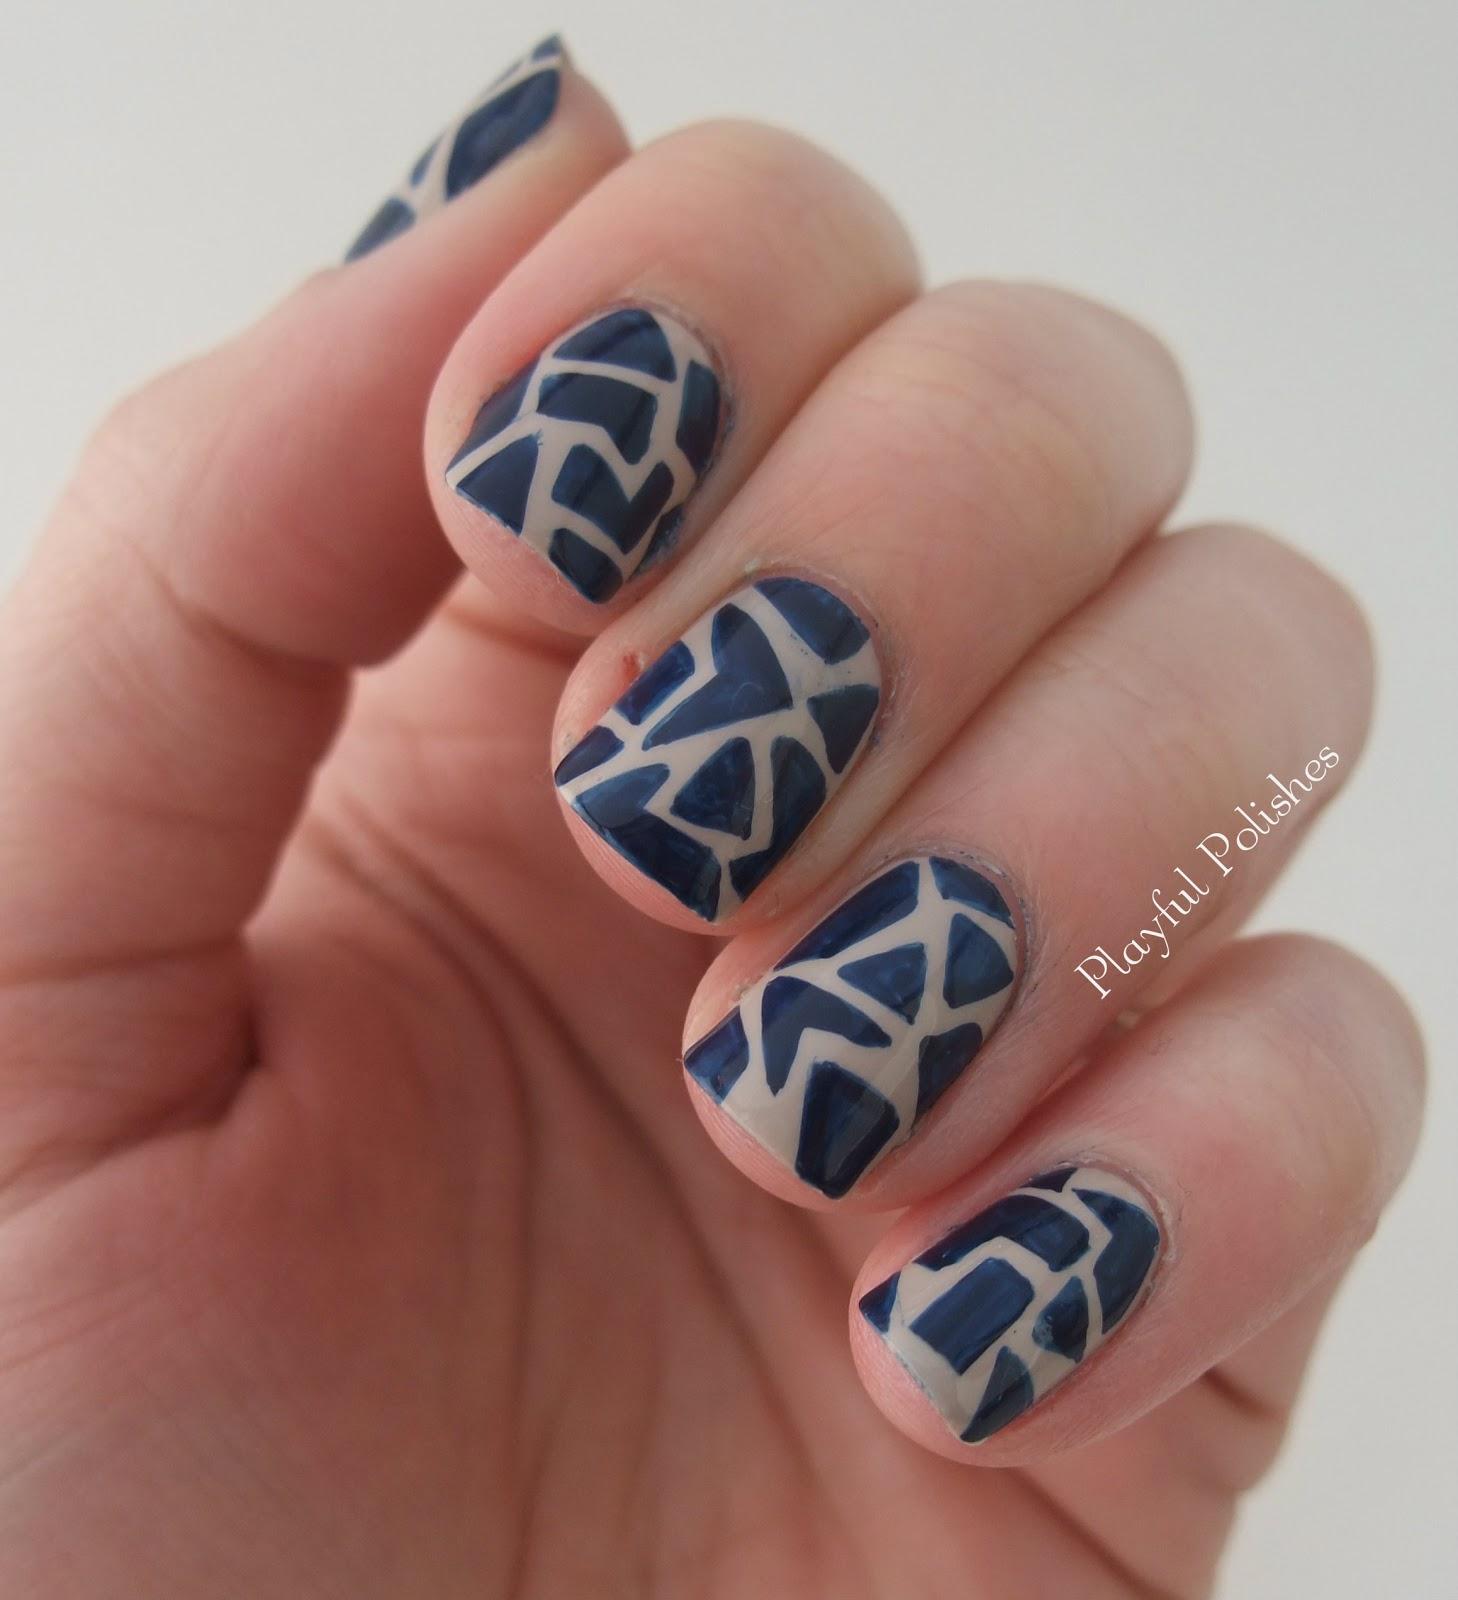 Nail Art February Challenge: Playful Polishes: JANUARY NAIL ART CHALLENGE: DAY 13